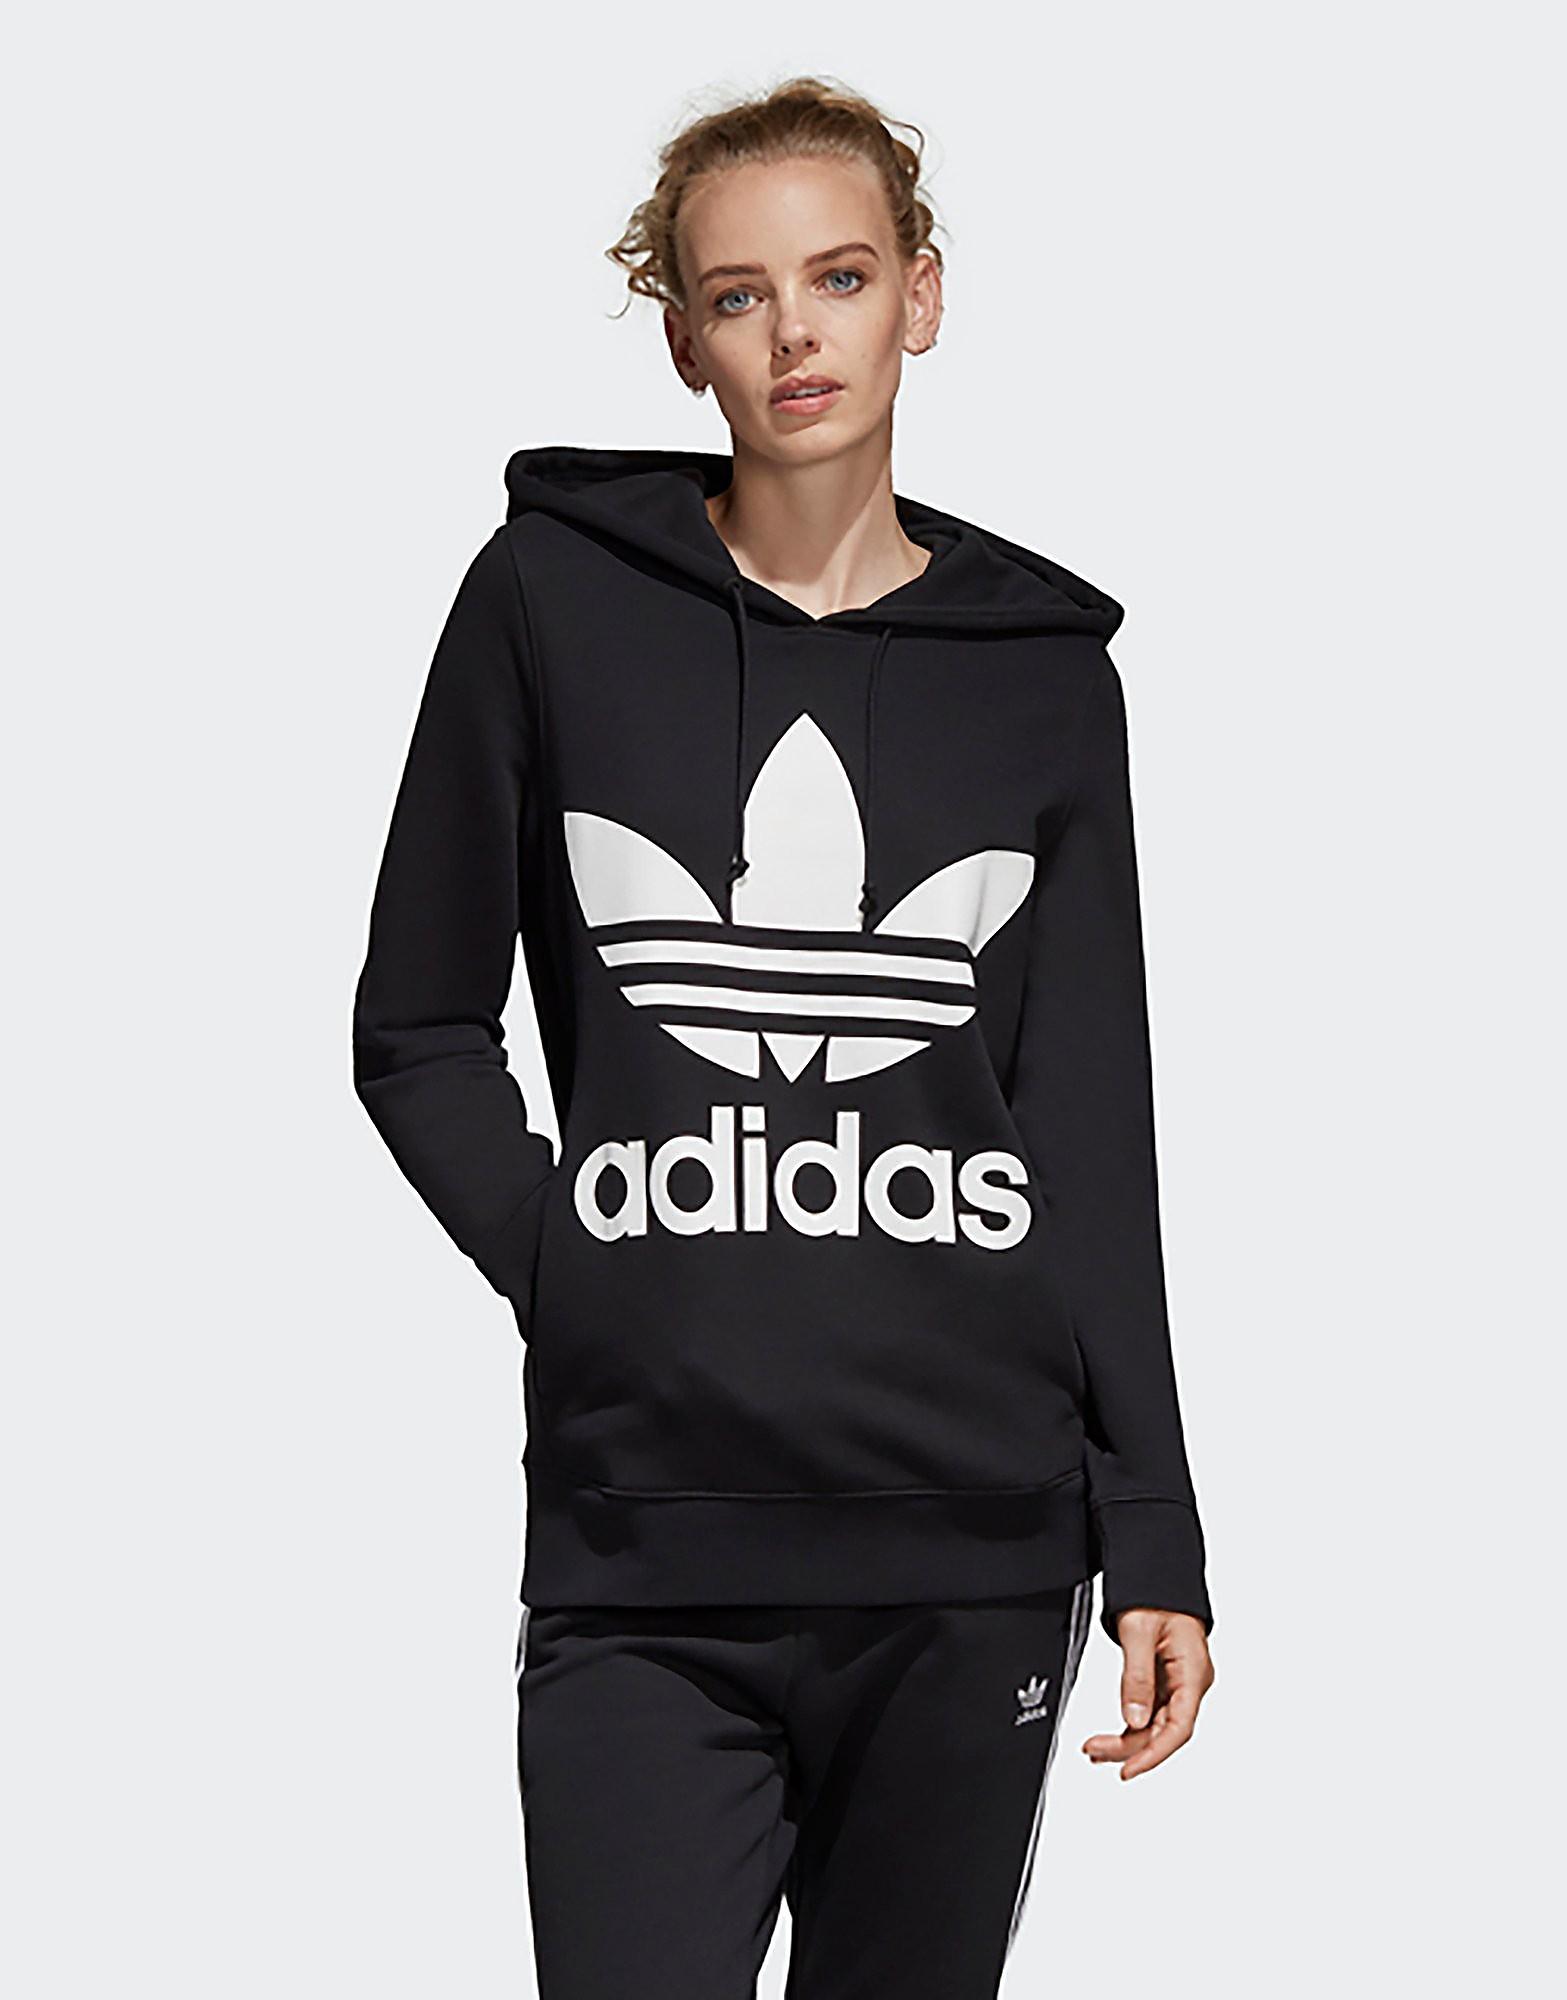 Adidas Hoodies Women Jd Sports